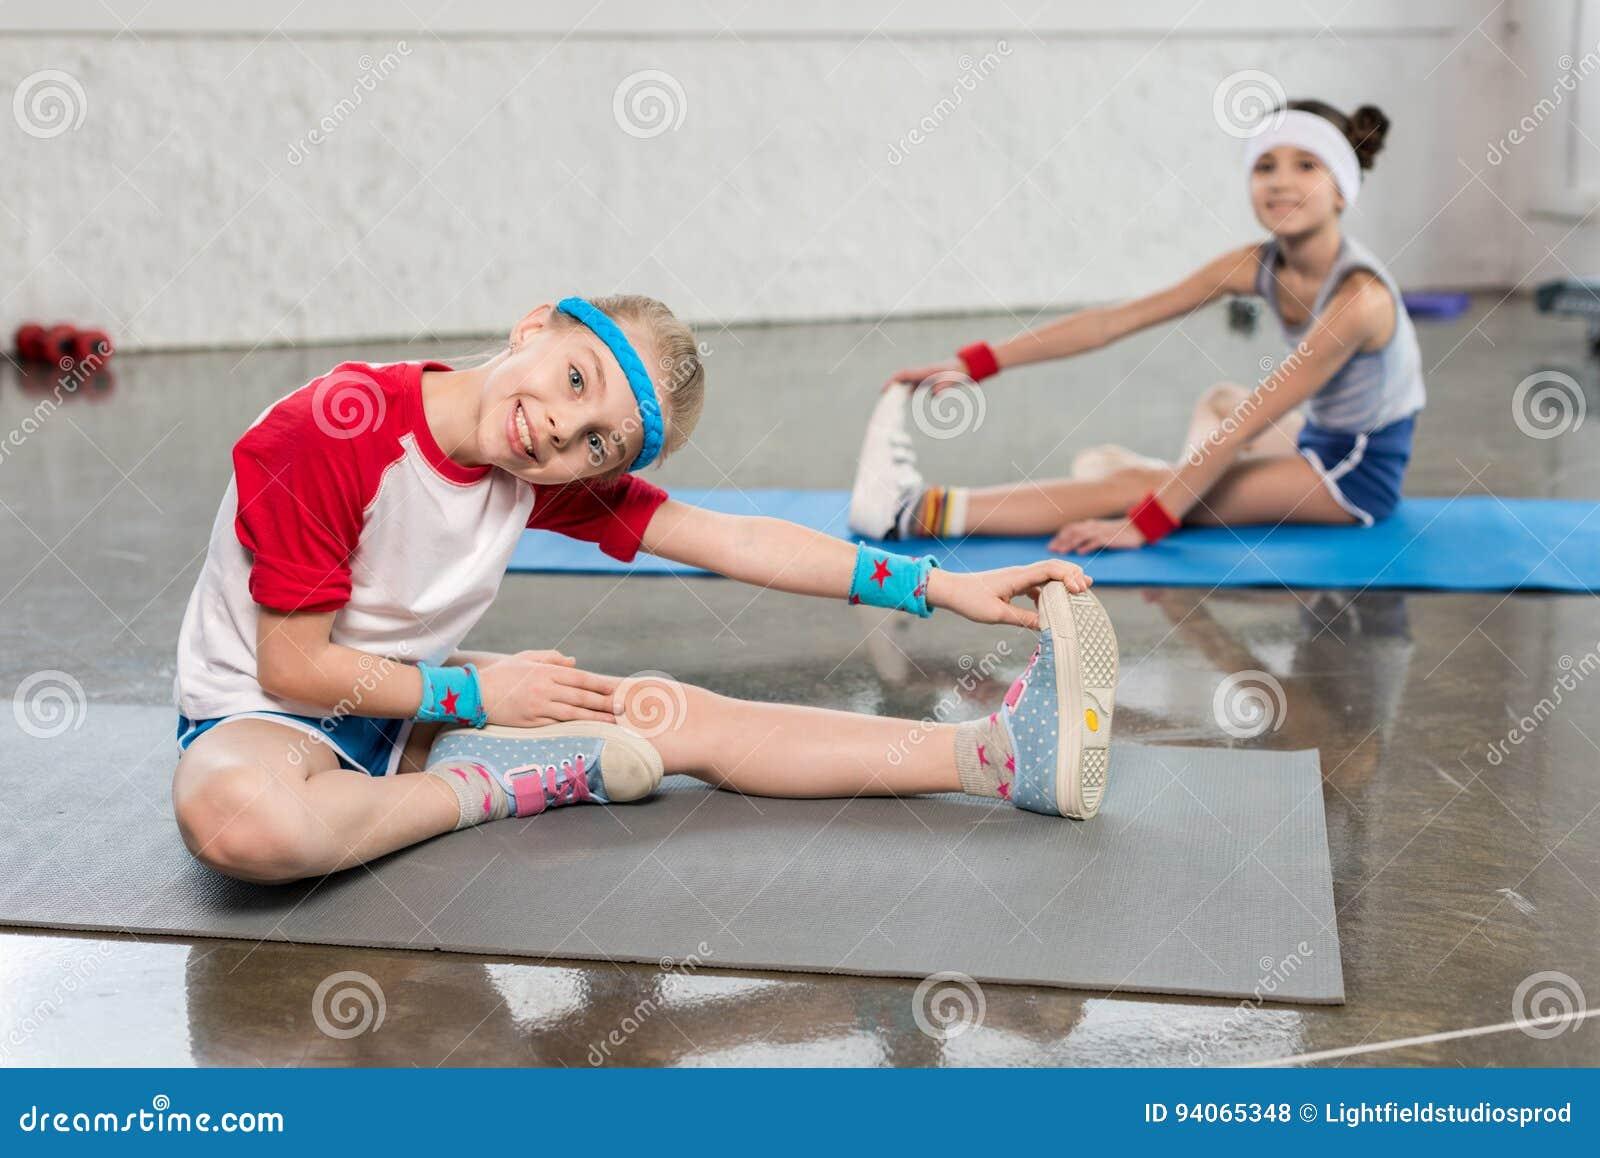 Adorable Little Girls In Sportswear Exercising On Yoga